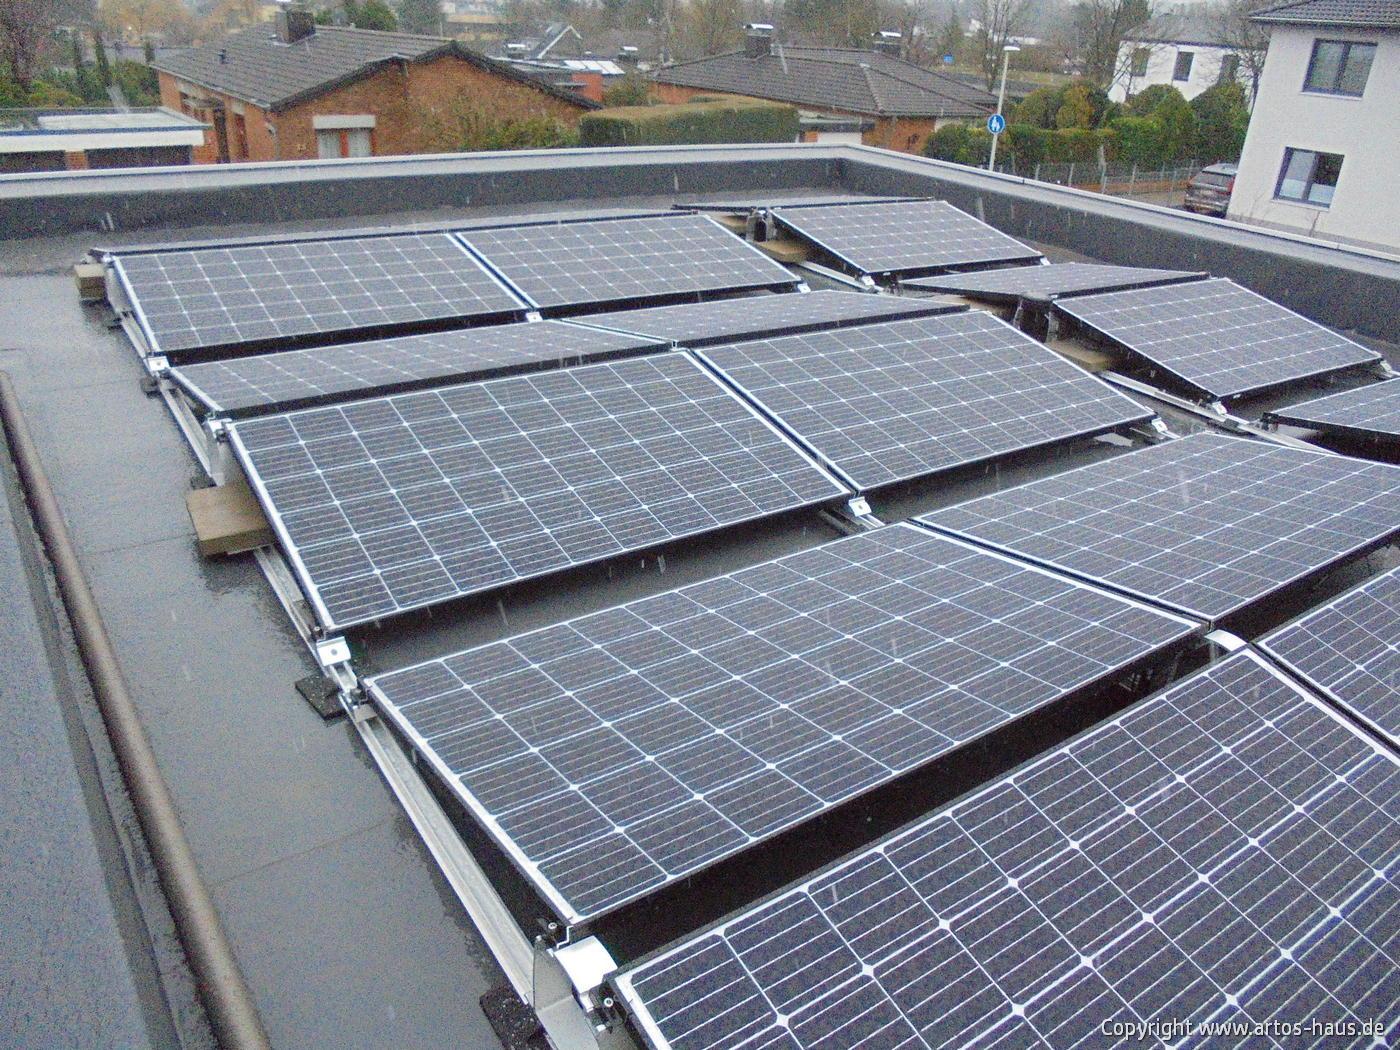 Photovoltaik ARTOS-HAUS Bild 2